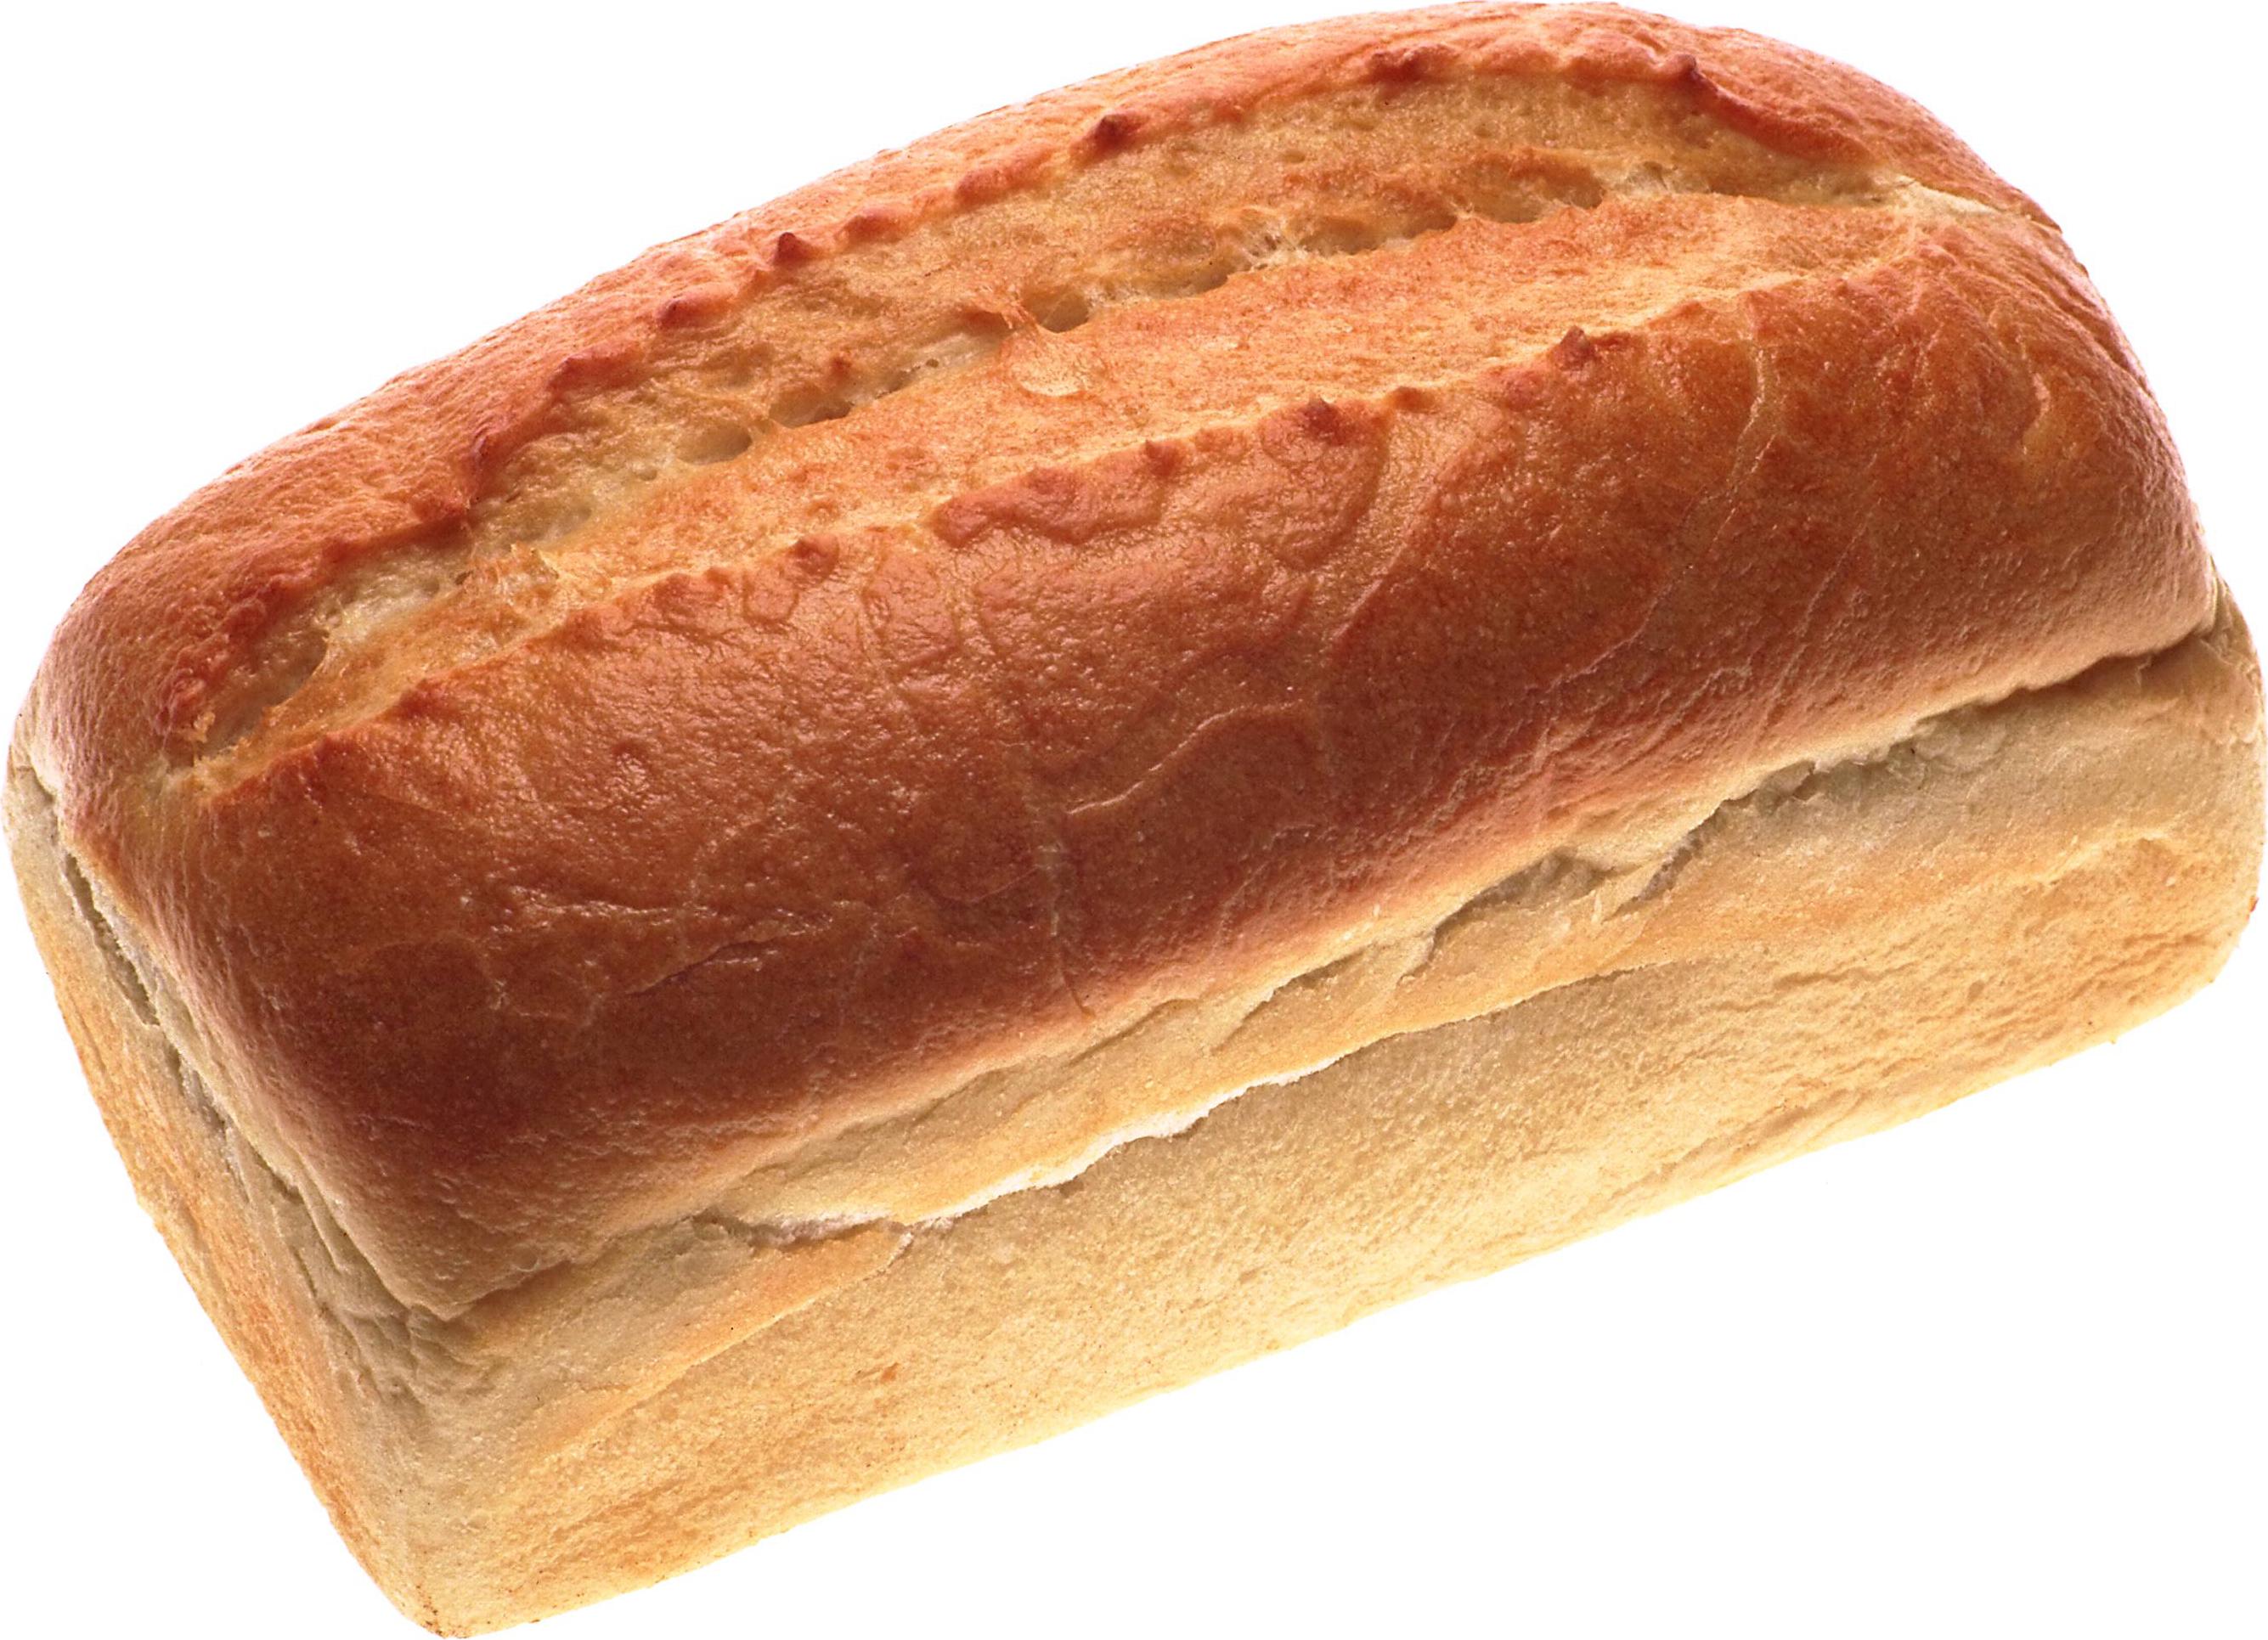 Bread HD PNG - 93325